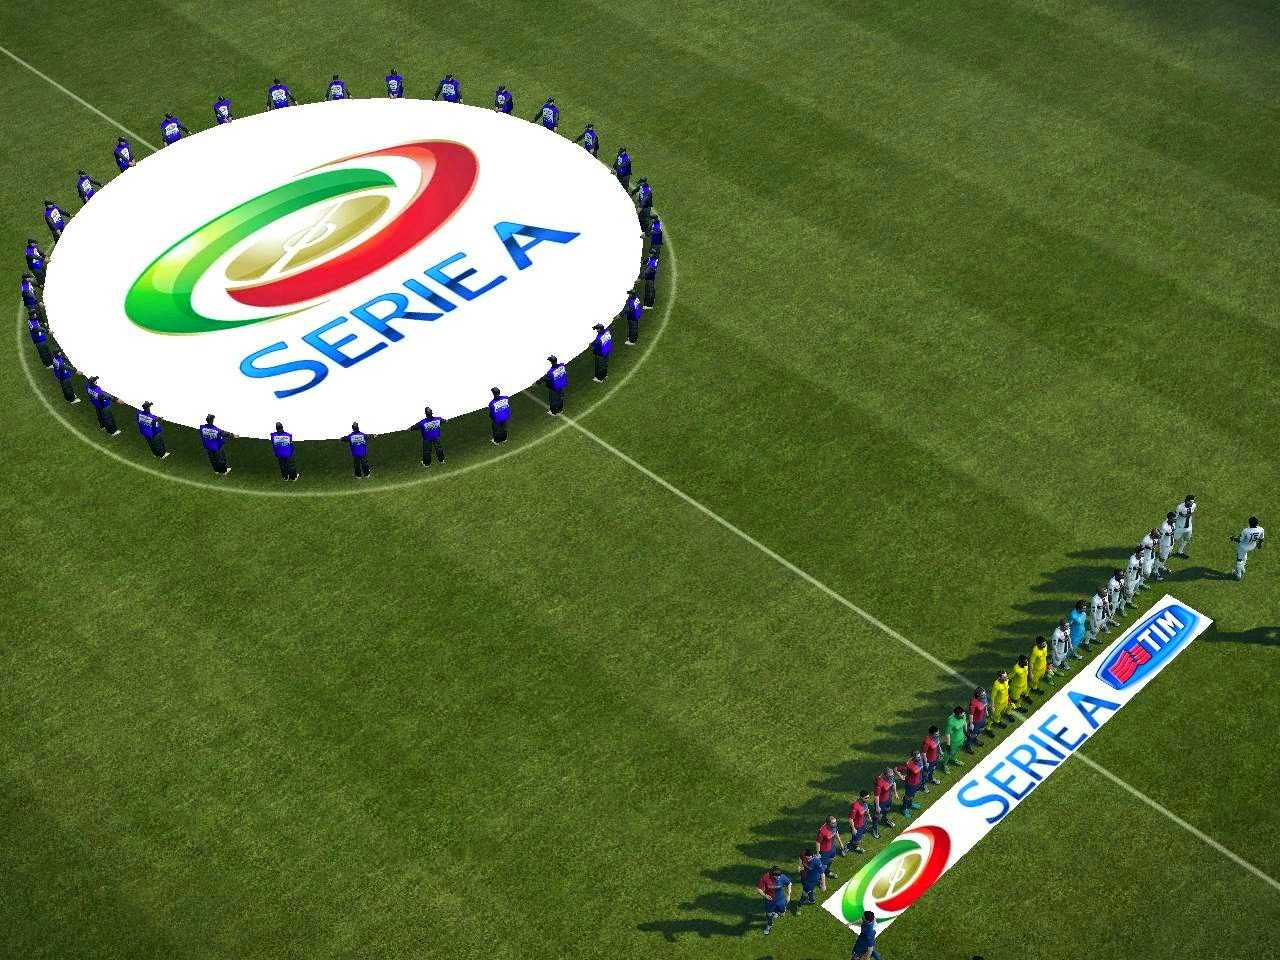 Juventus torino diretta tv streaming e ultime notizie for Diretta notizie